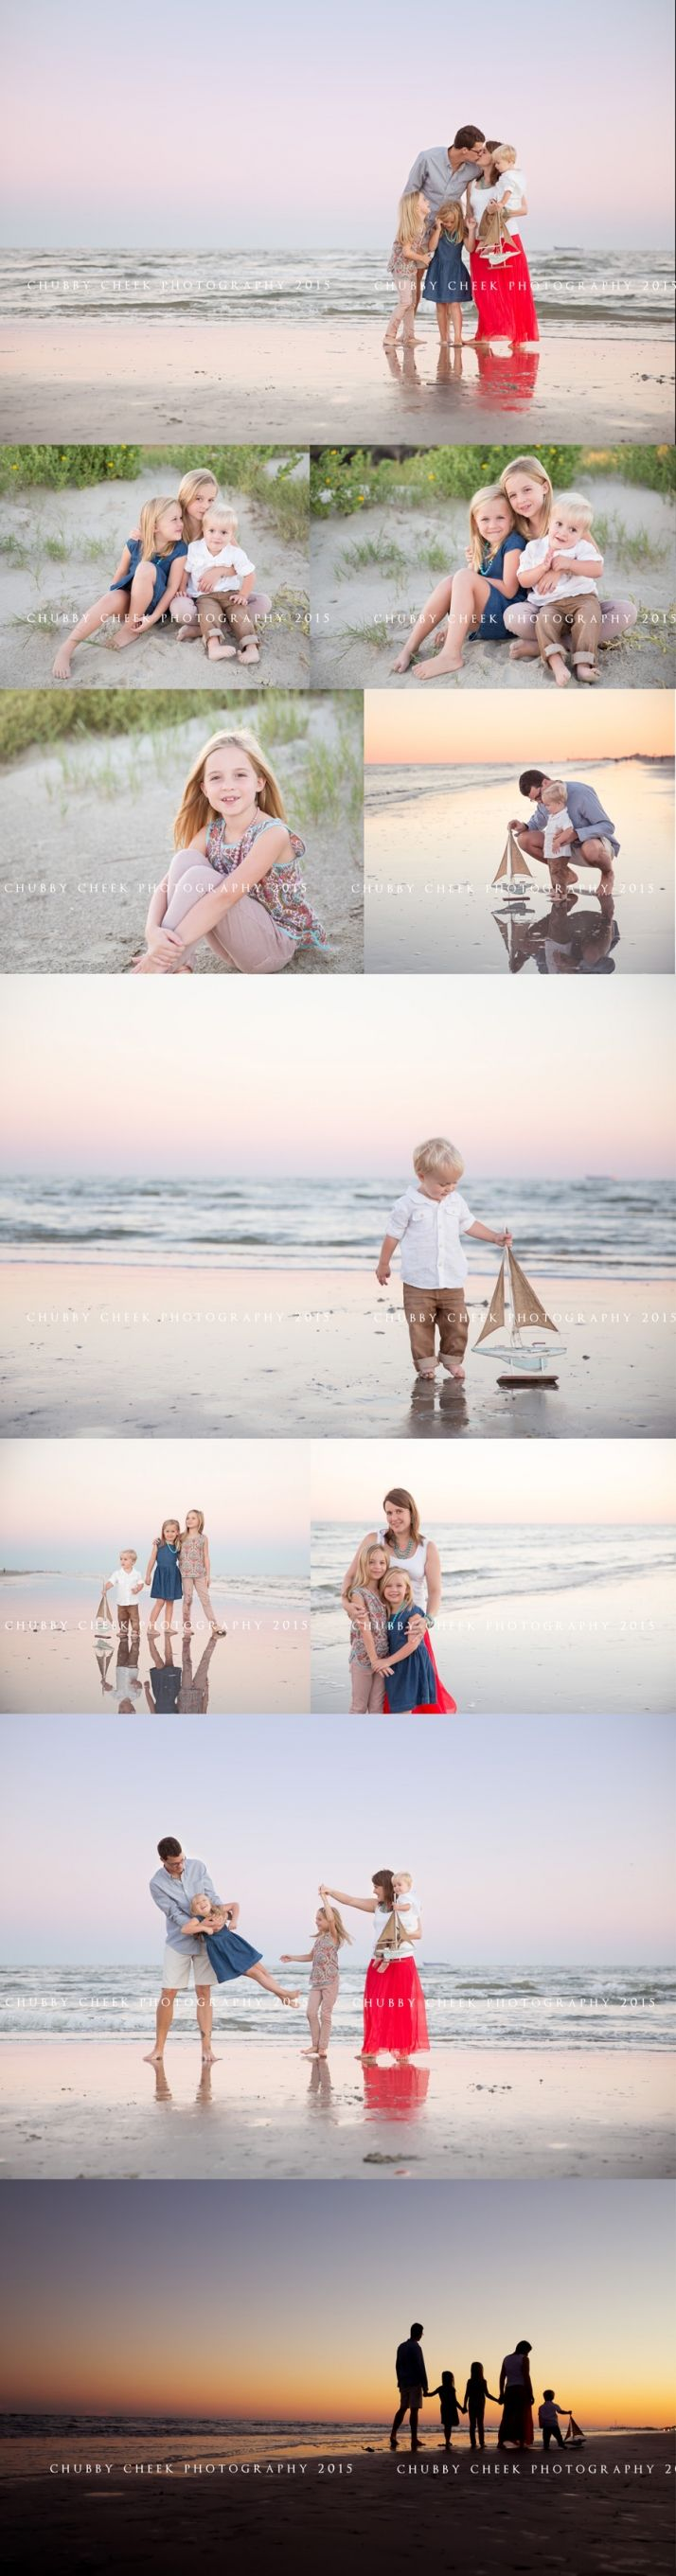 chubby cheek photography beach mini sessions